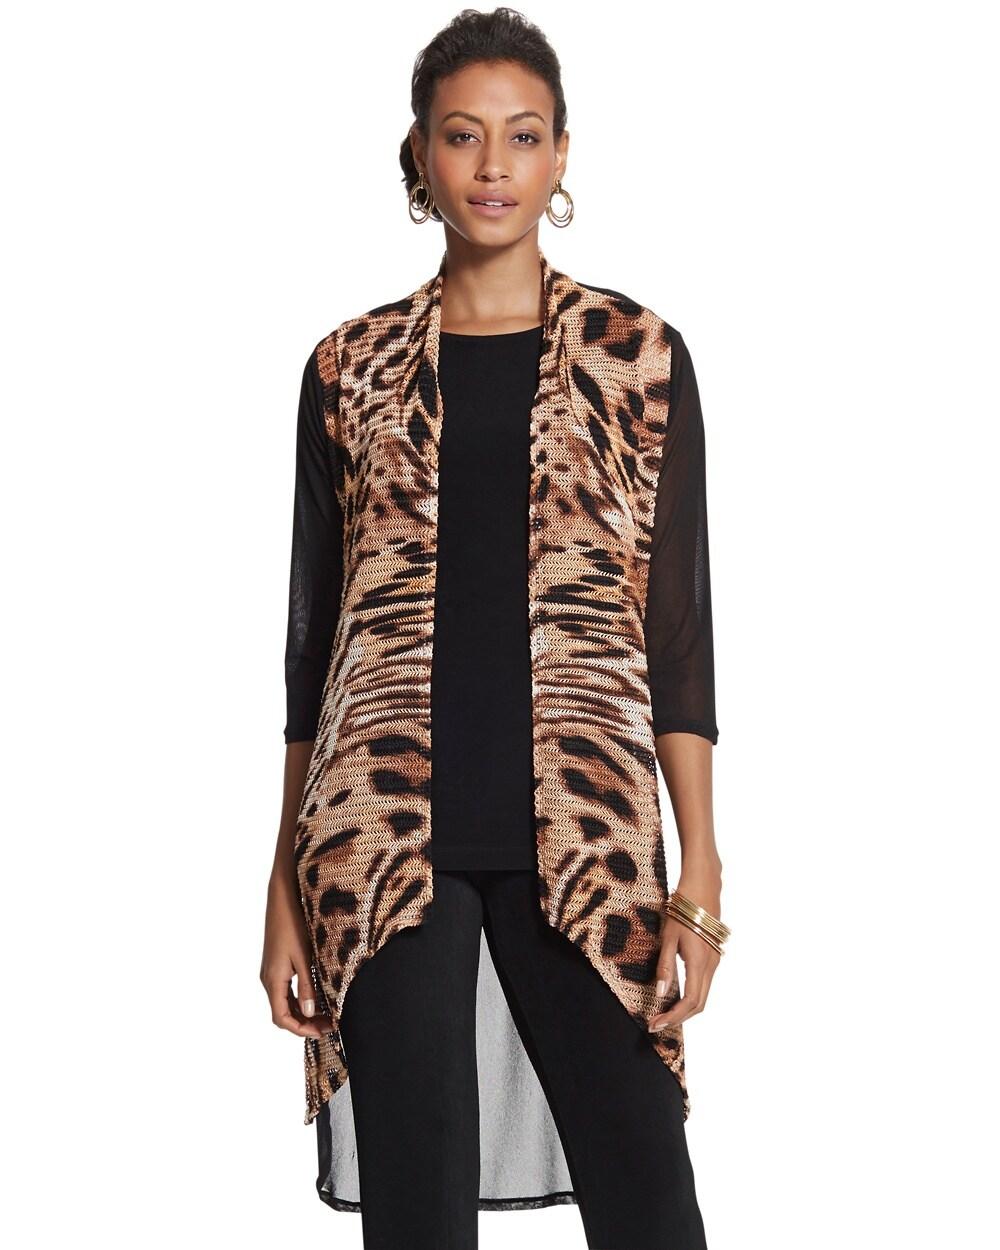 ab307b439ff4 Leopard-Print Jacket - Chico's